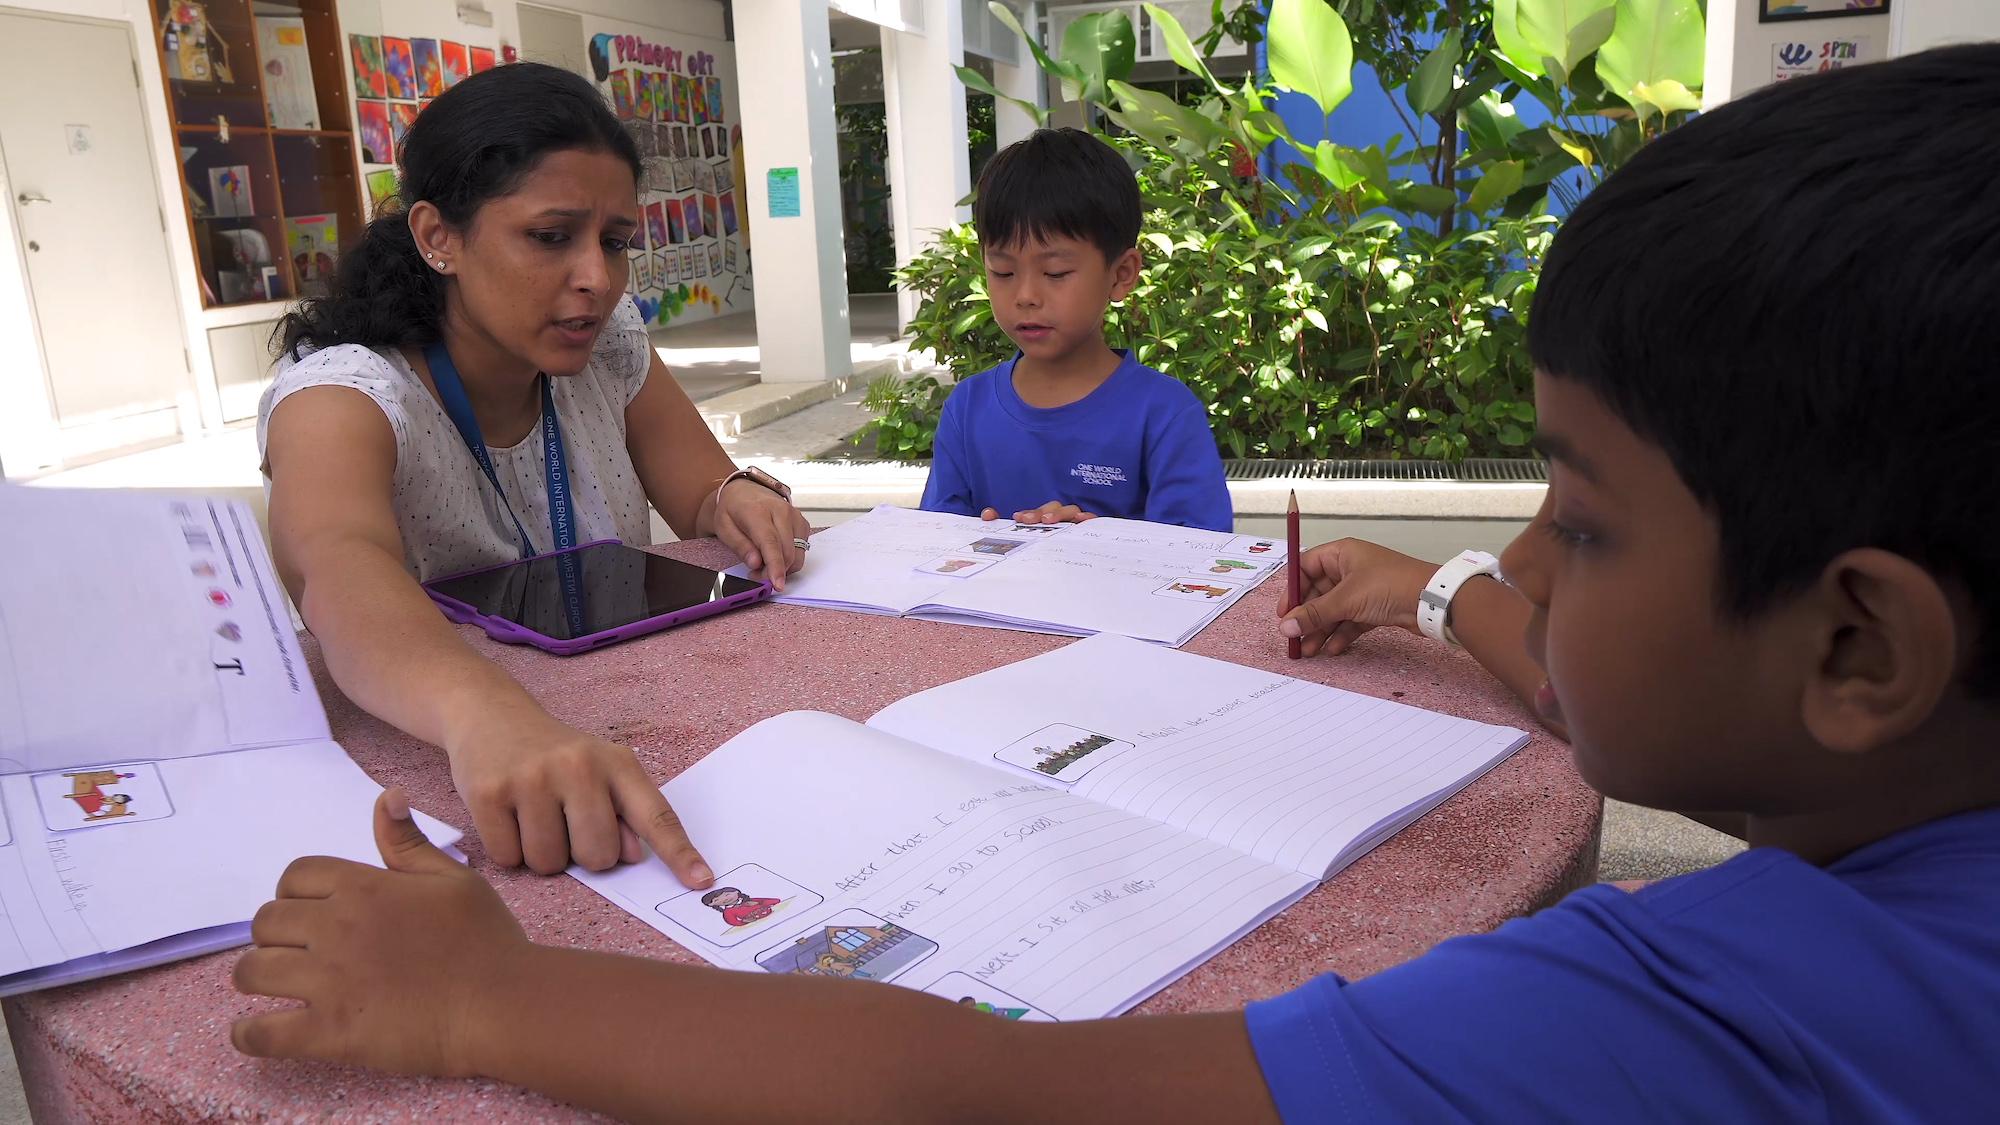 OWIS teachers use positive language to motivate preschool students